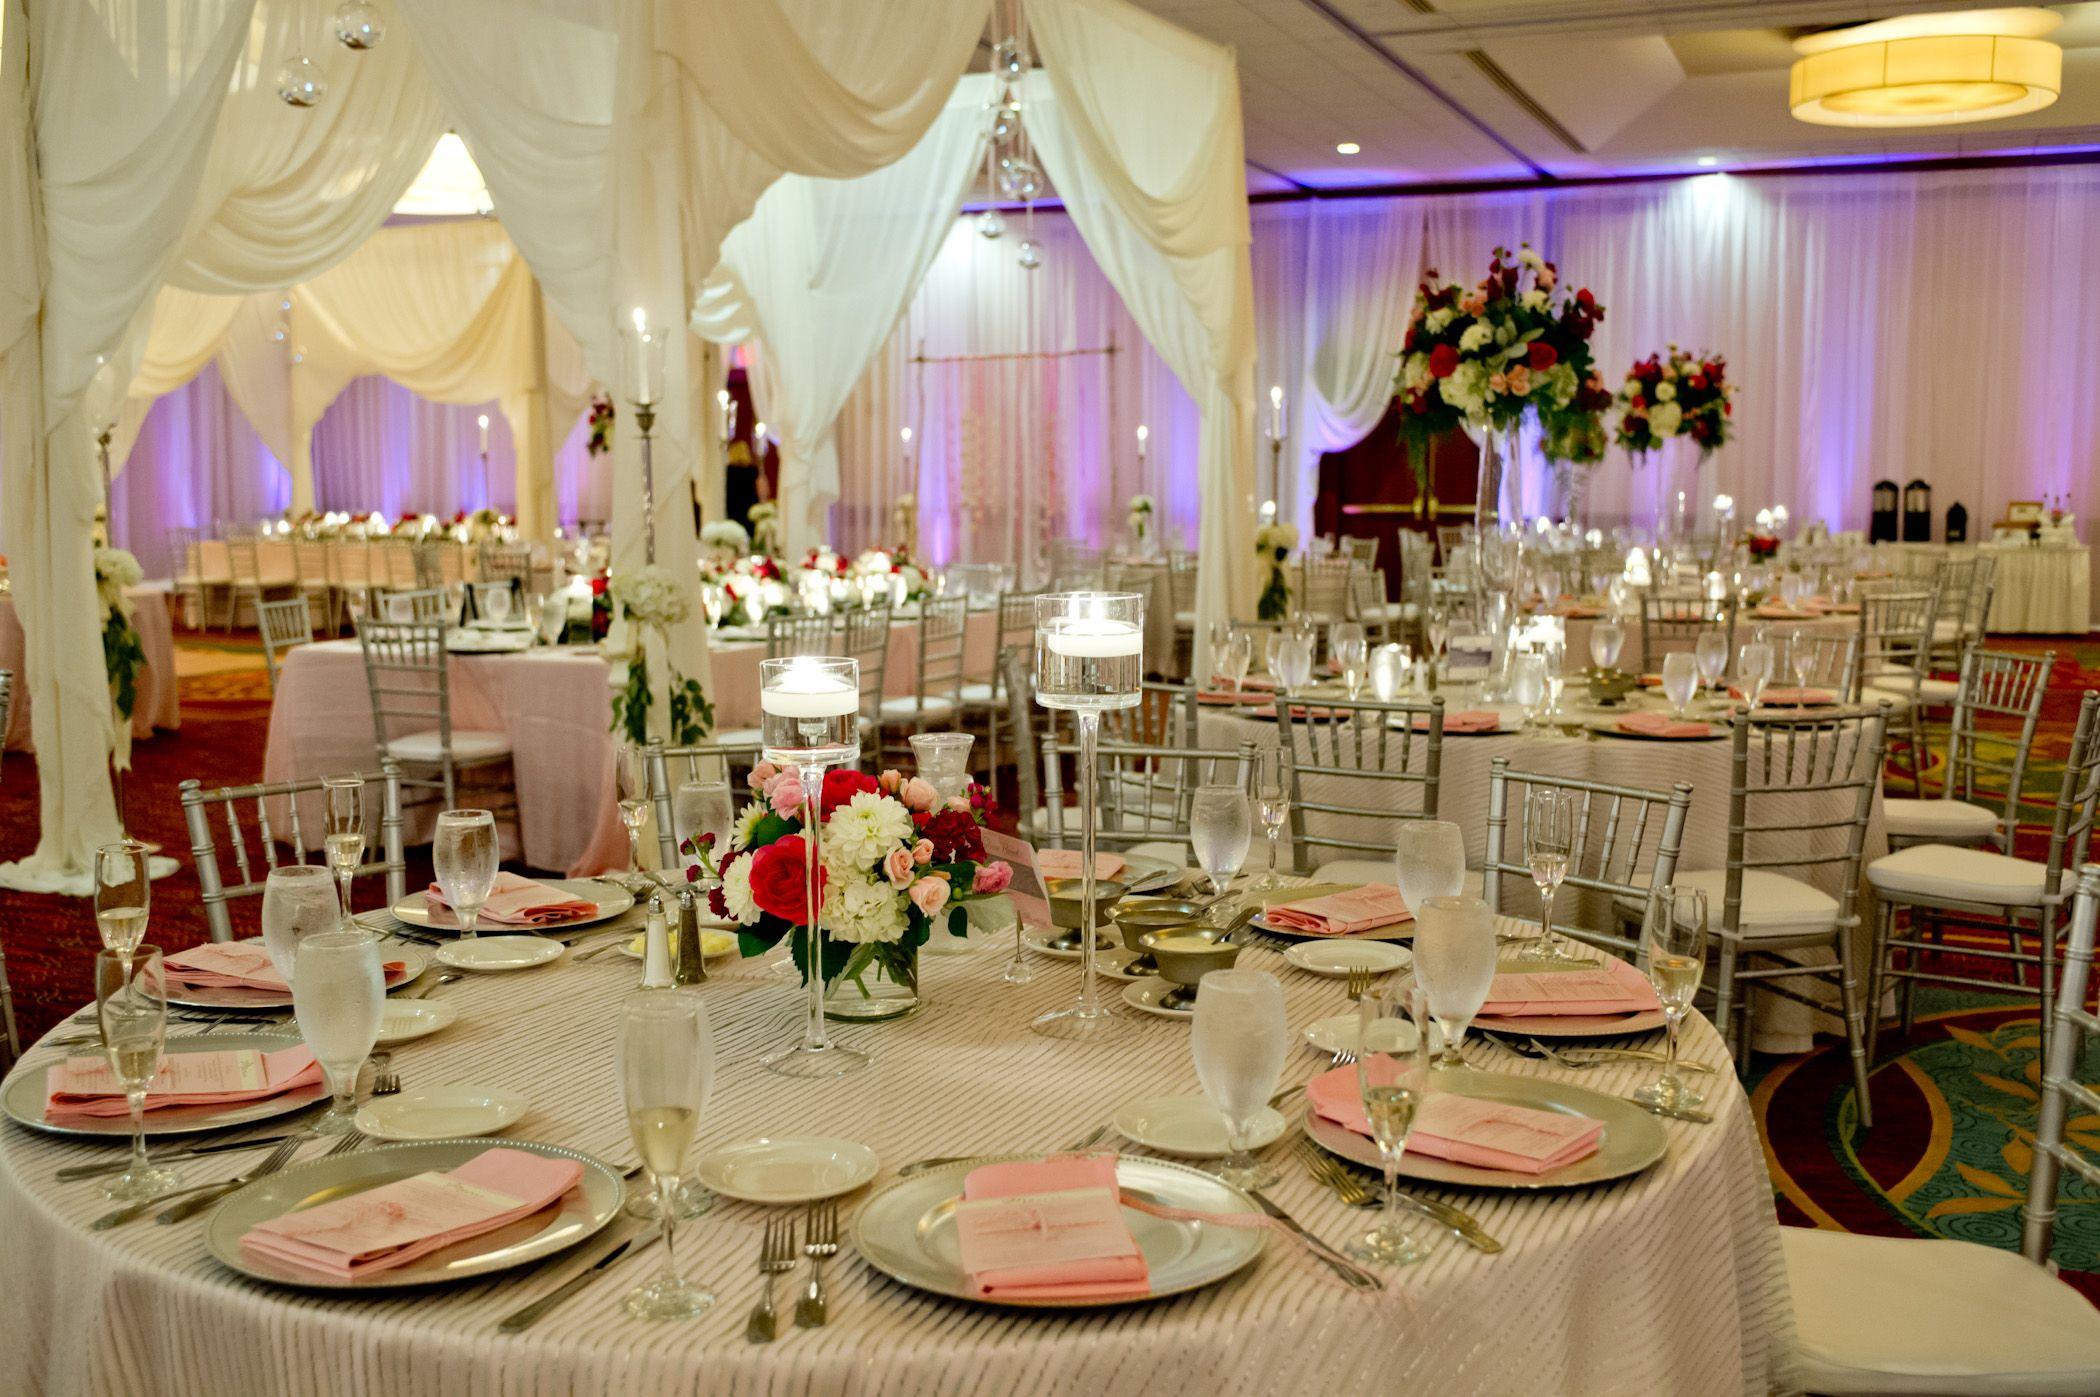 Wedding reception decoration images  nsideringlilies  TablesReception Decor  Pinterest